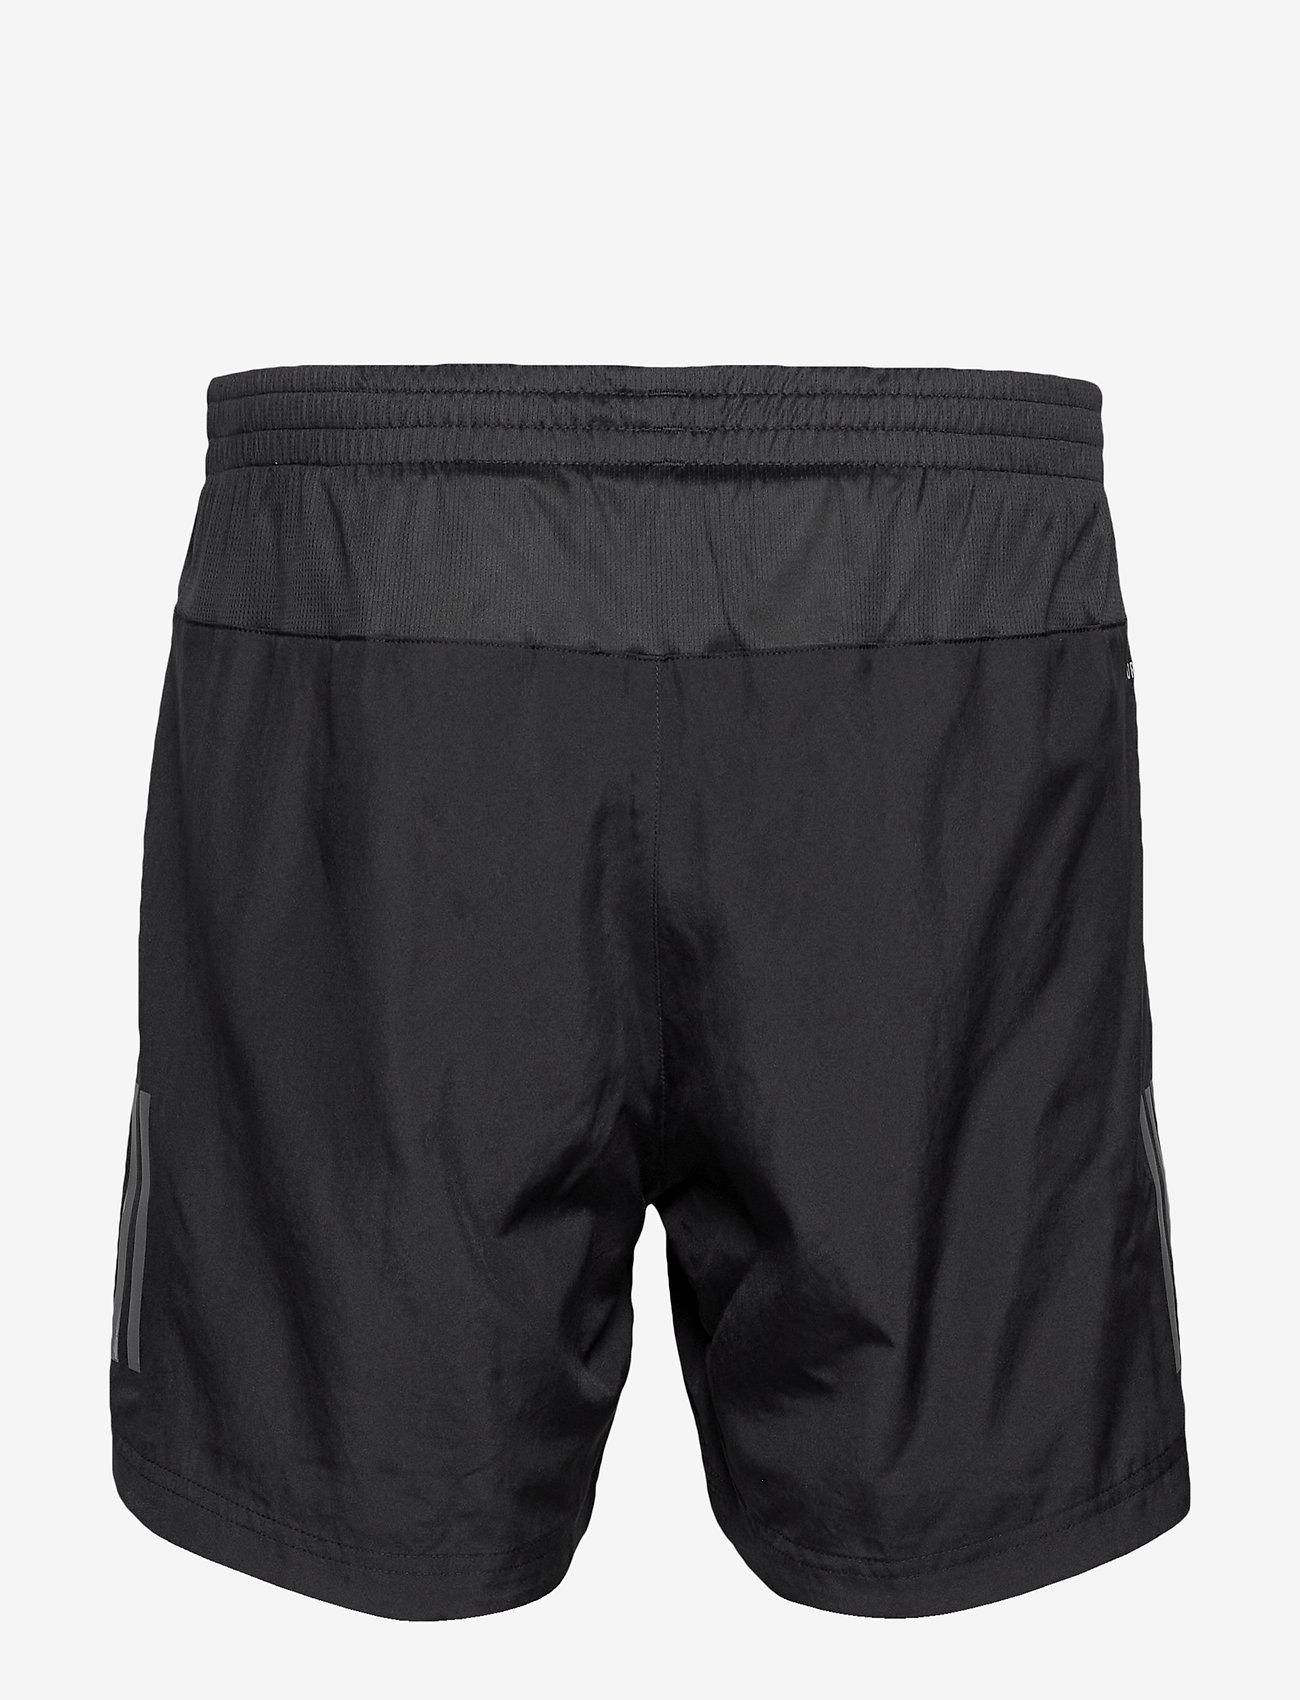 Adidas Performance Own The Run 2n1 - Shorts Black/sesosl